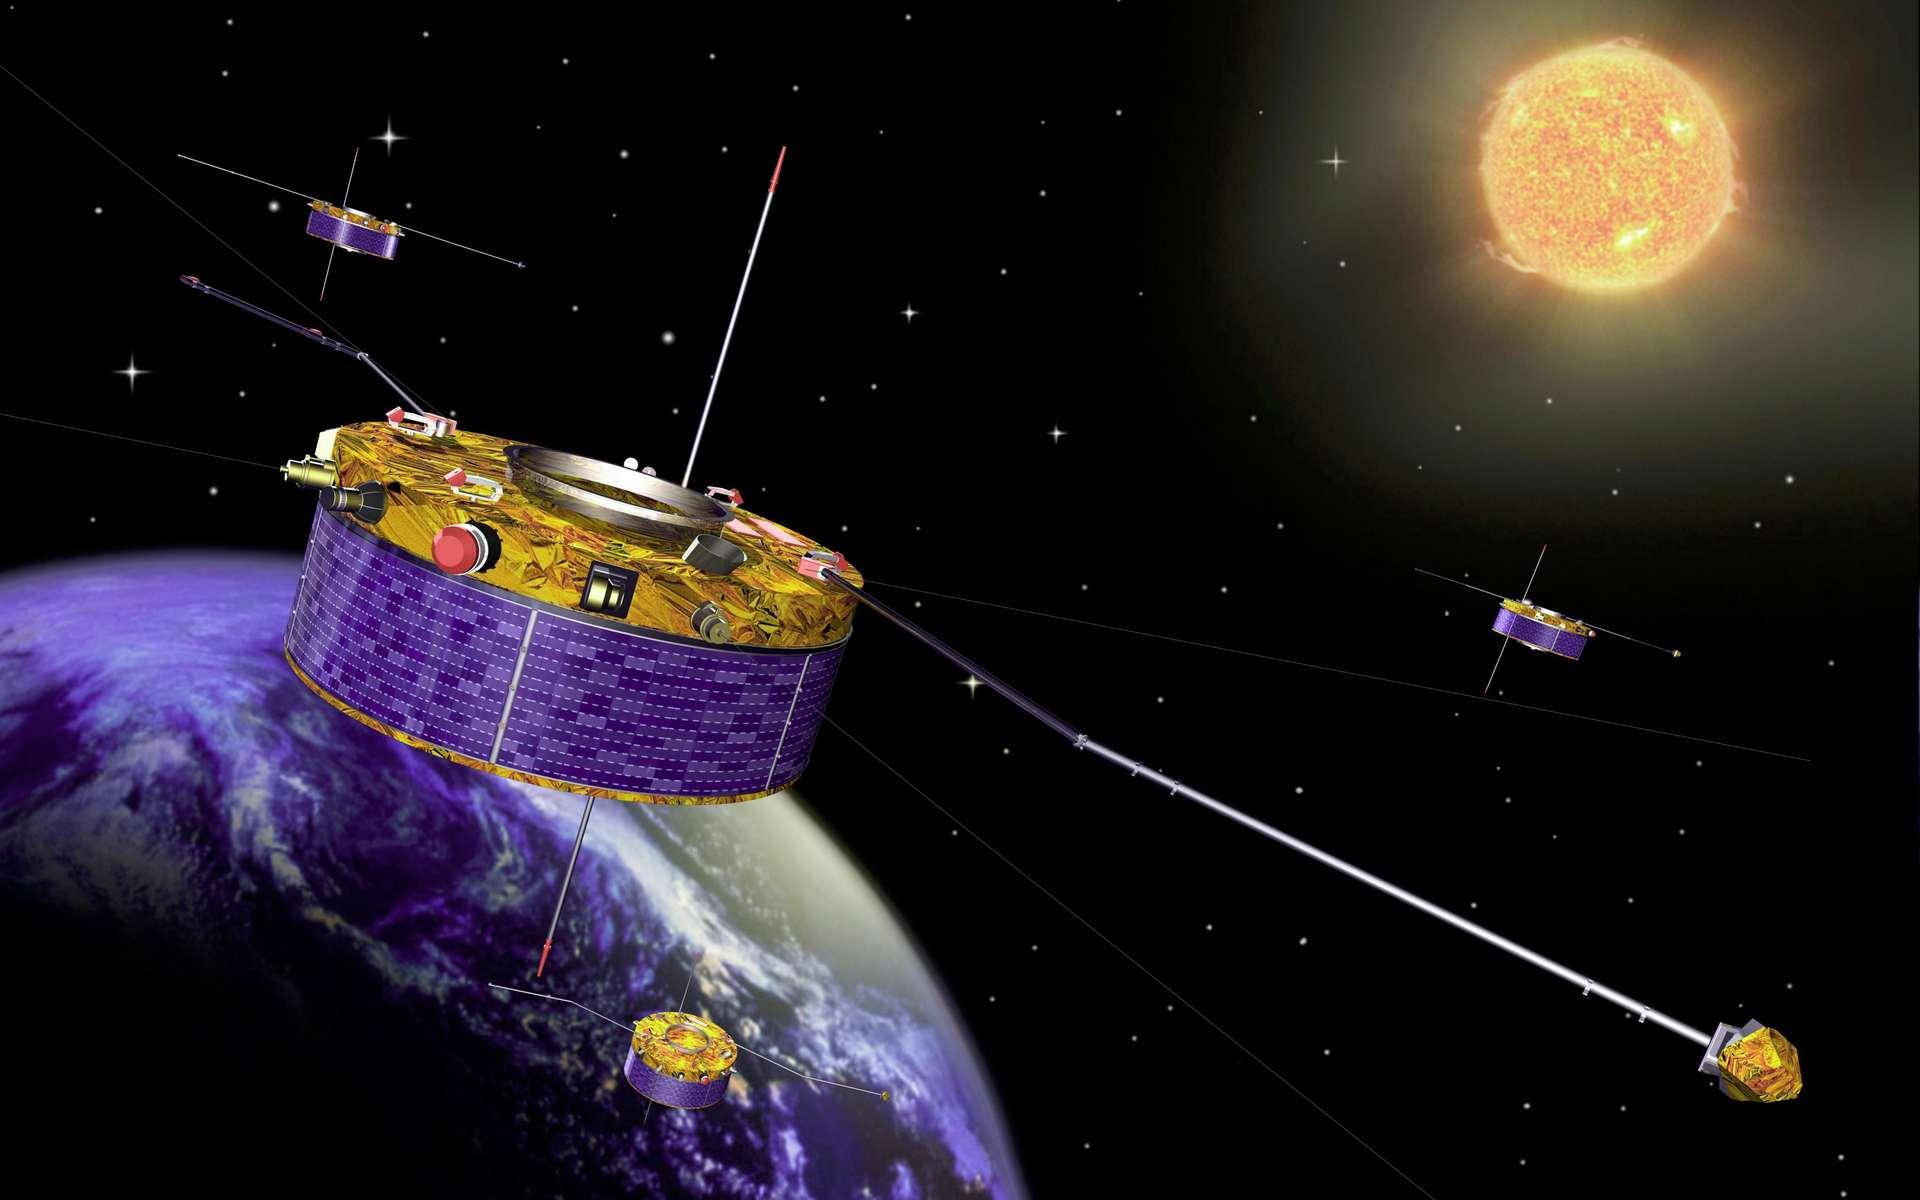 Illustration des quatre satellites de la mission Cluster. © ESA, Nasa